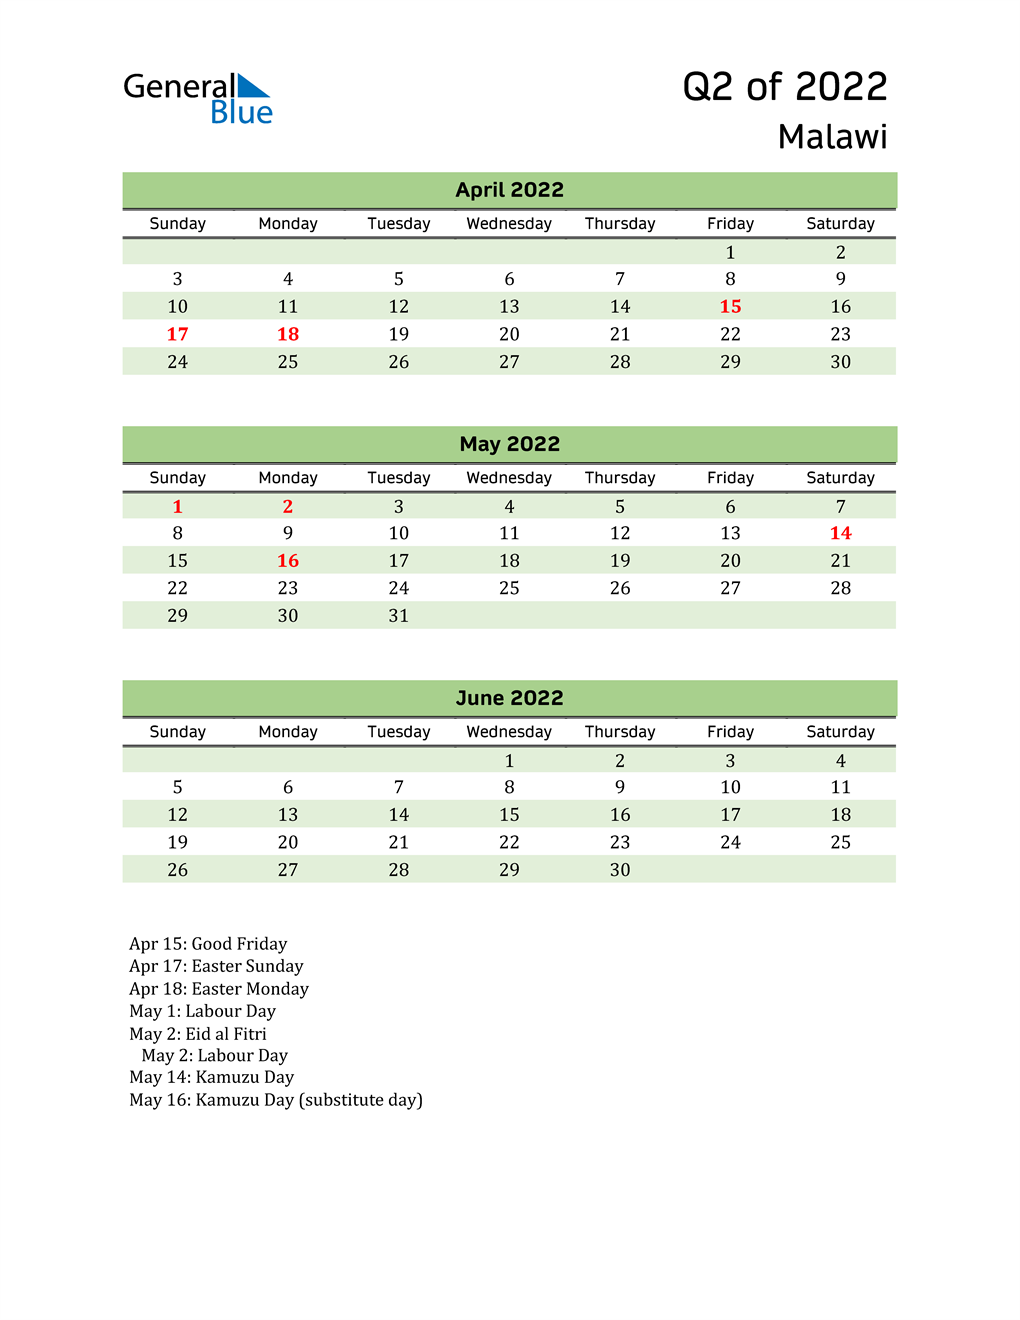 Quarterly Calendar 2022 with Malawi Holidays